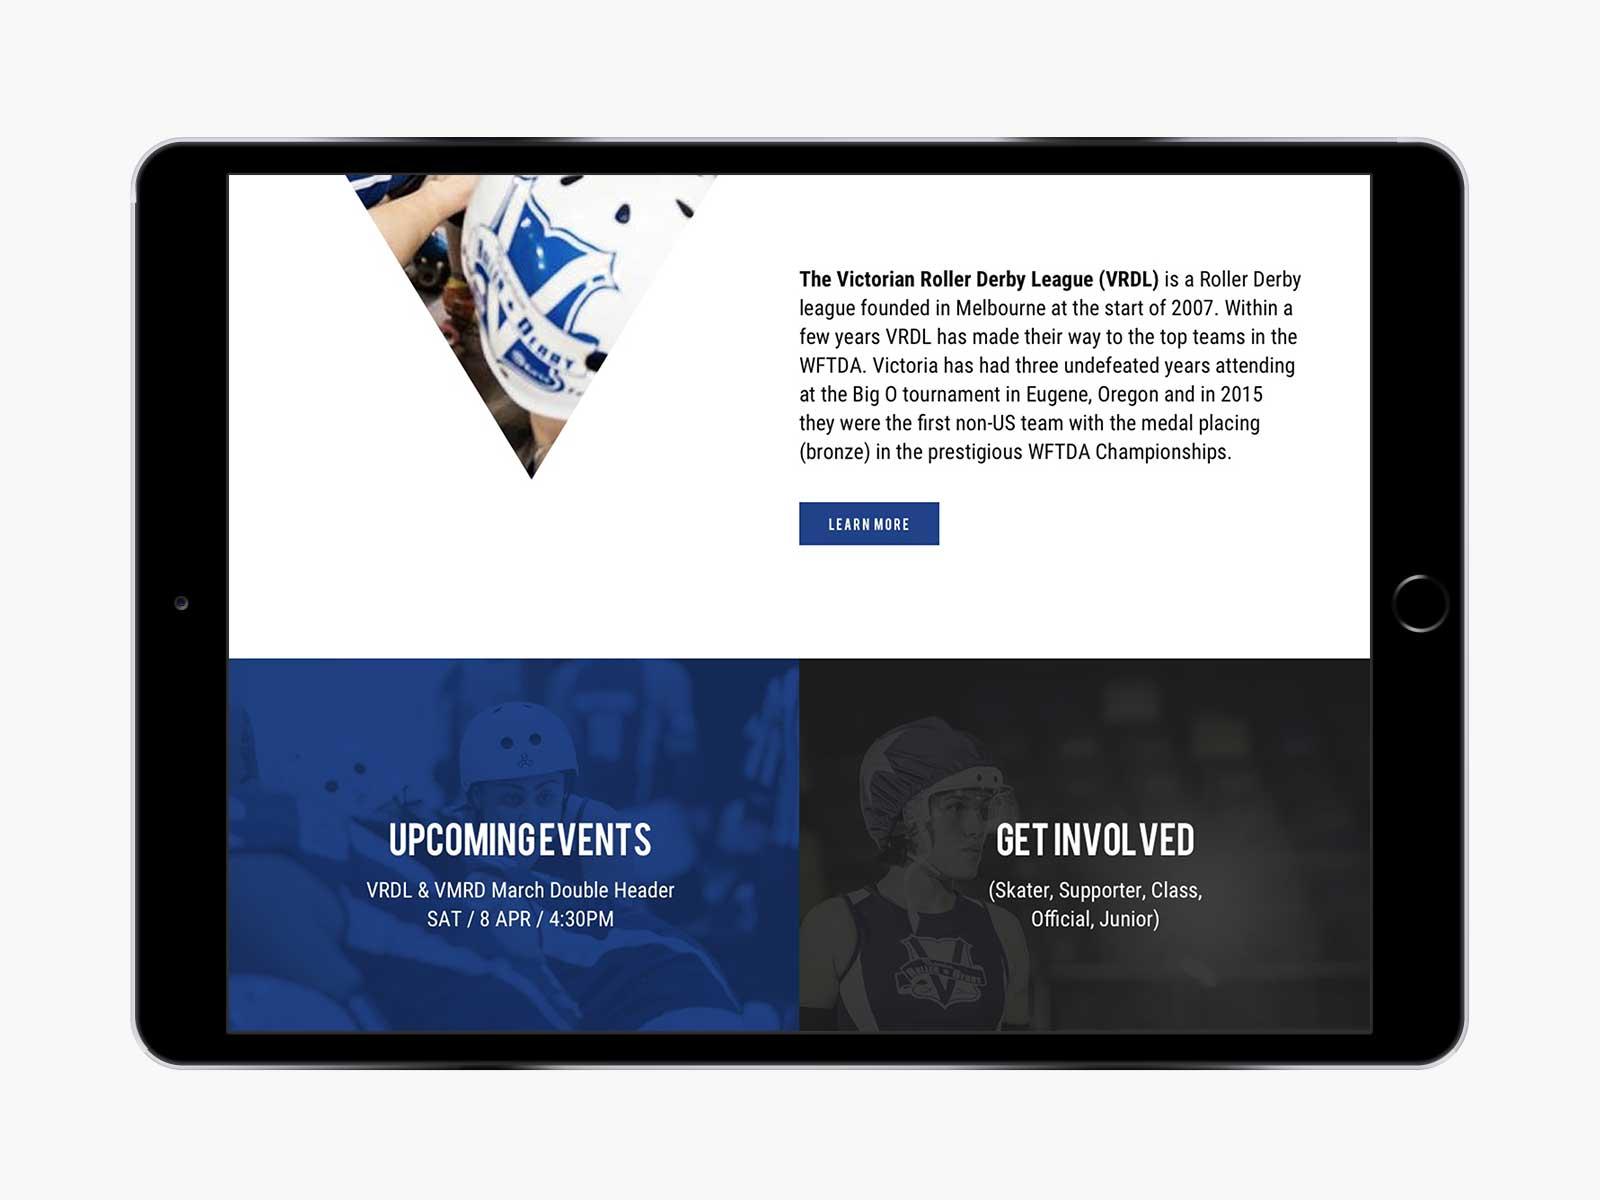 Victorian Roller Derby League responsive website design for navigation menu on iPad in landscape view